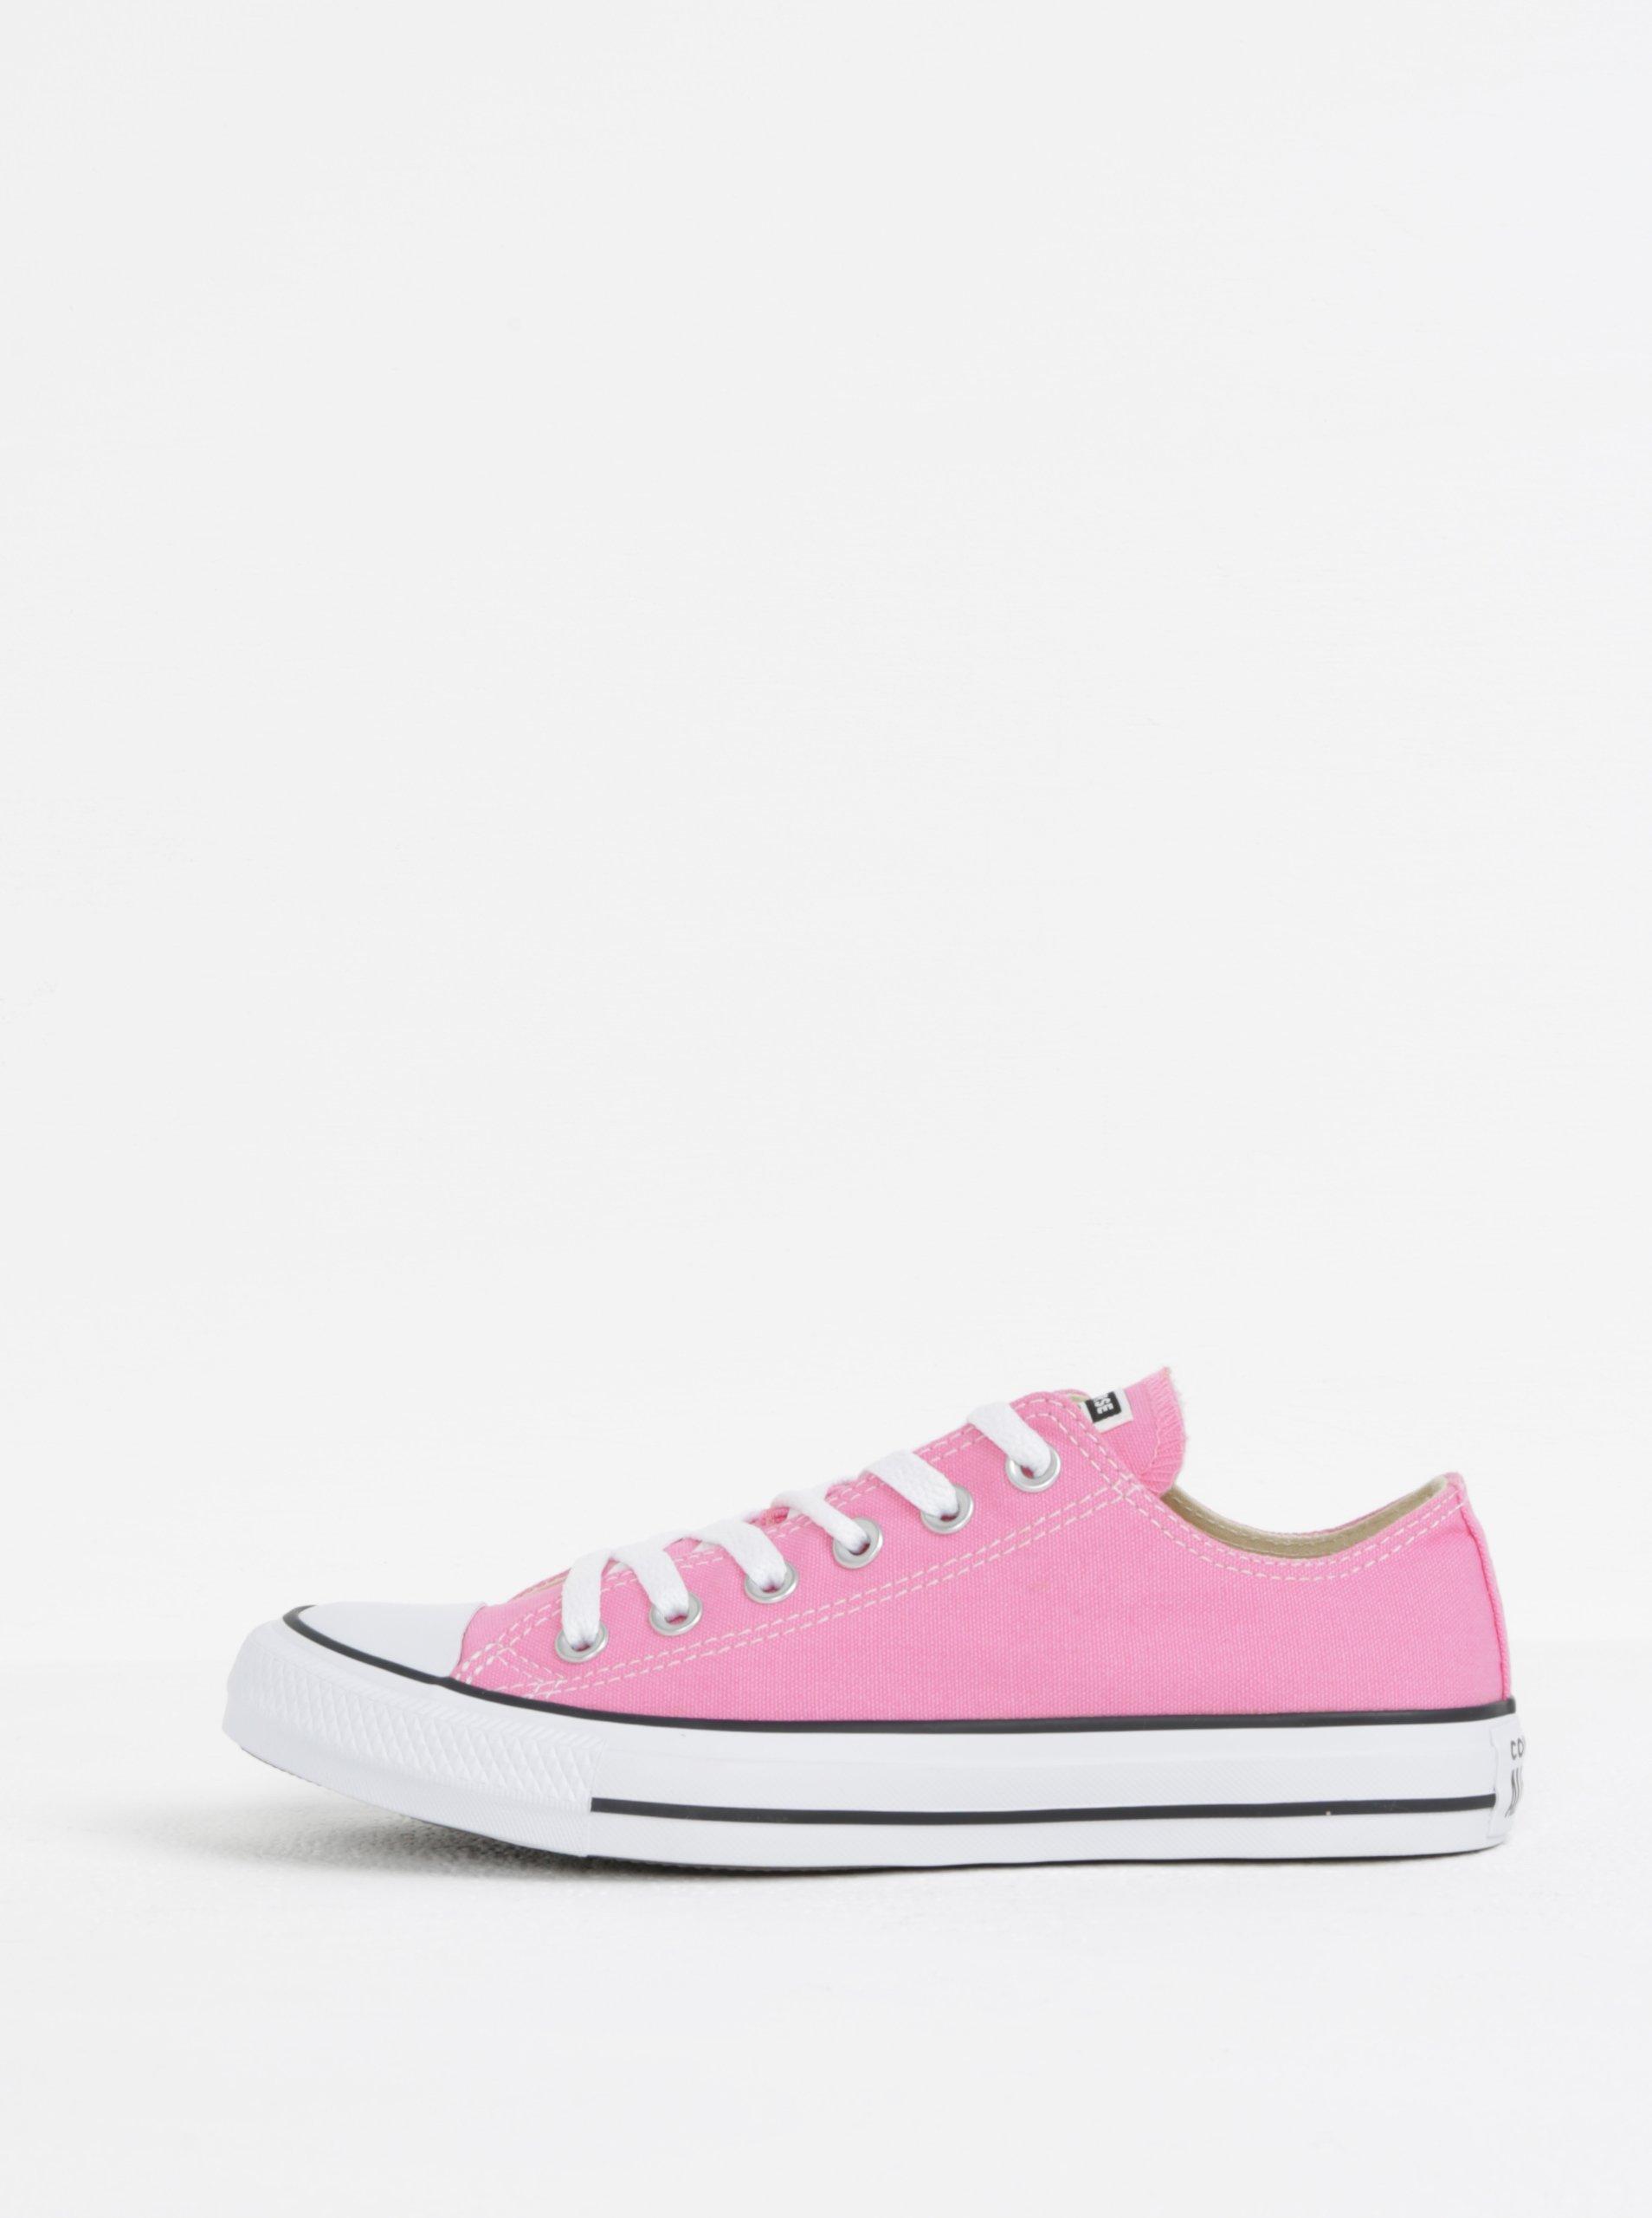 e37cd7d401c7 Ružové dámske tenisky Converse Chuck Taylor All Star